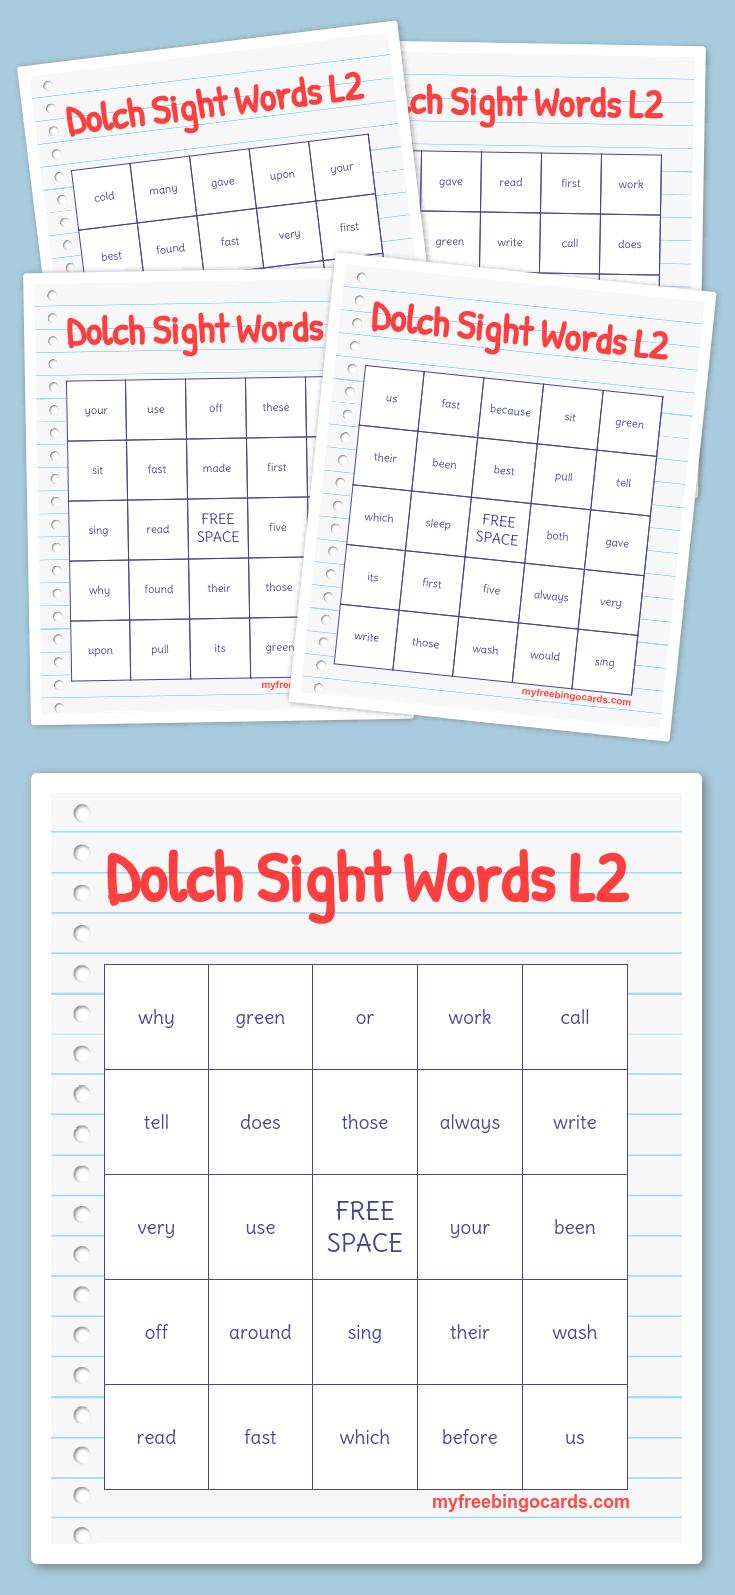 Dolch Sight Words L2 Bingo   Free Printable Bingo Cards